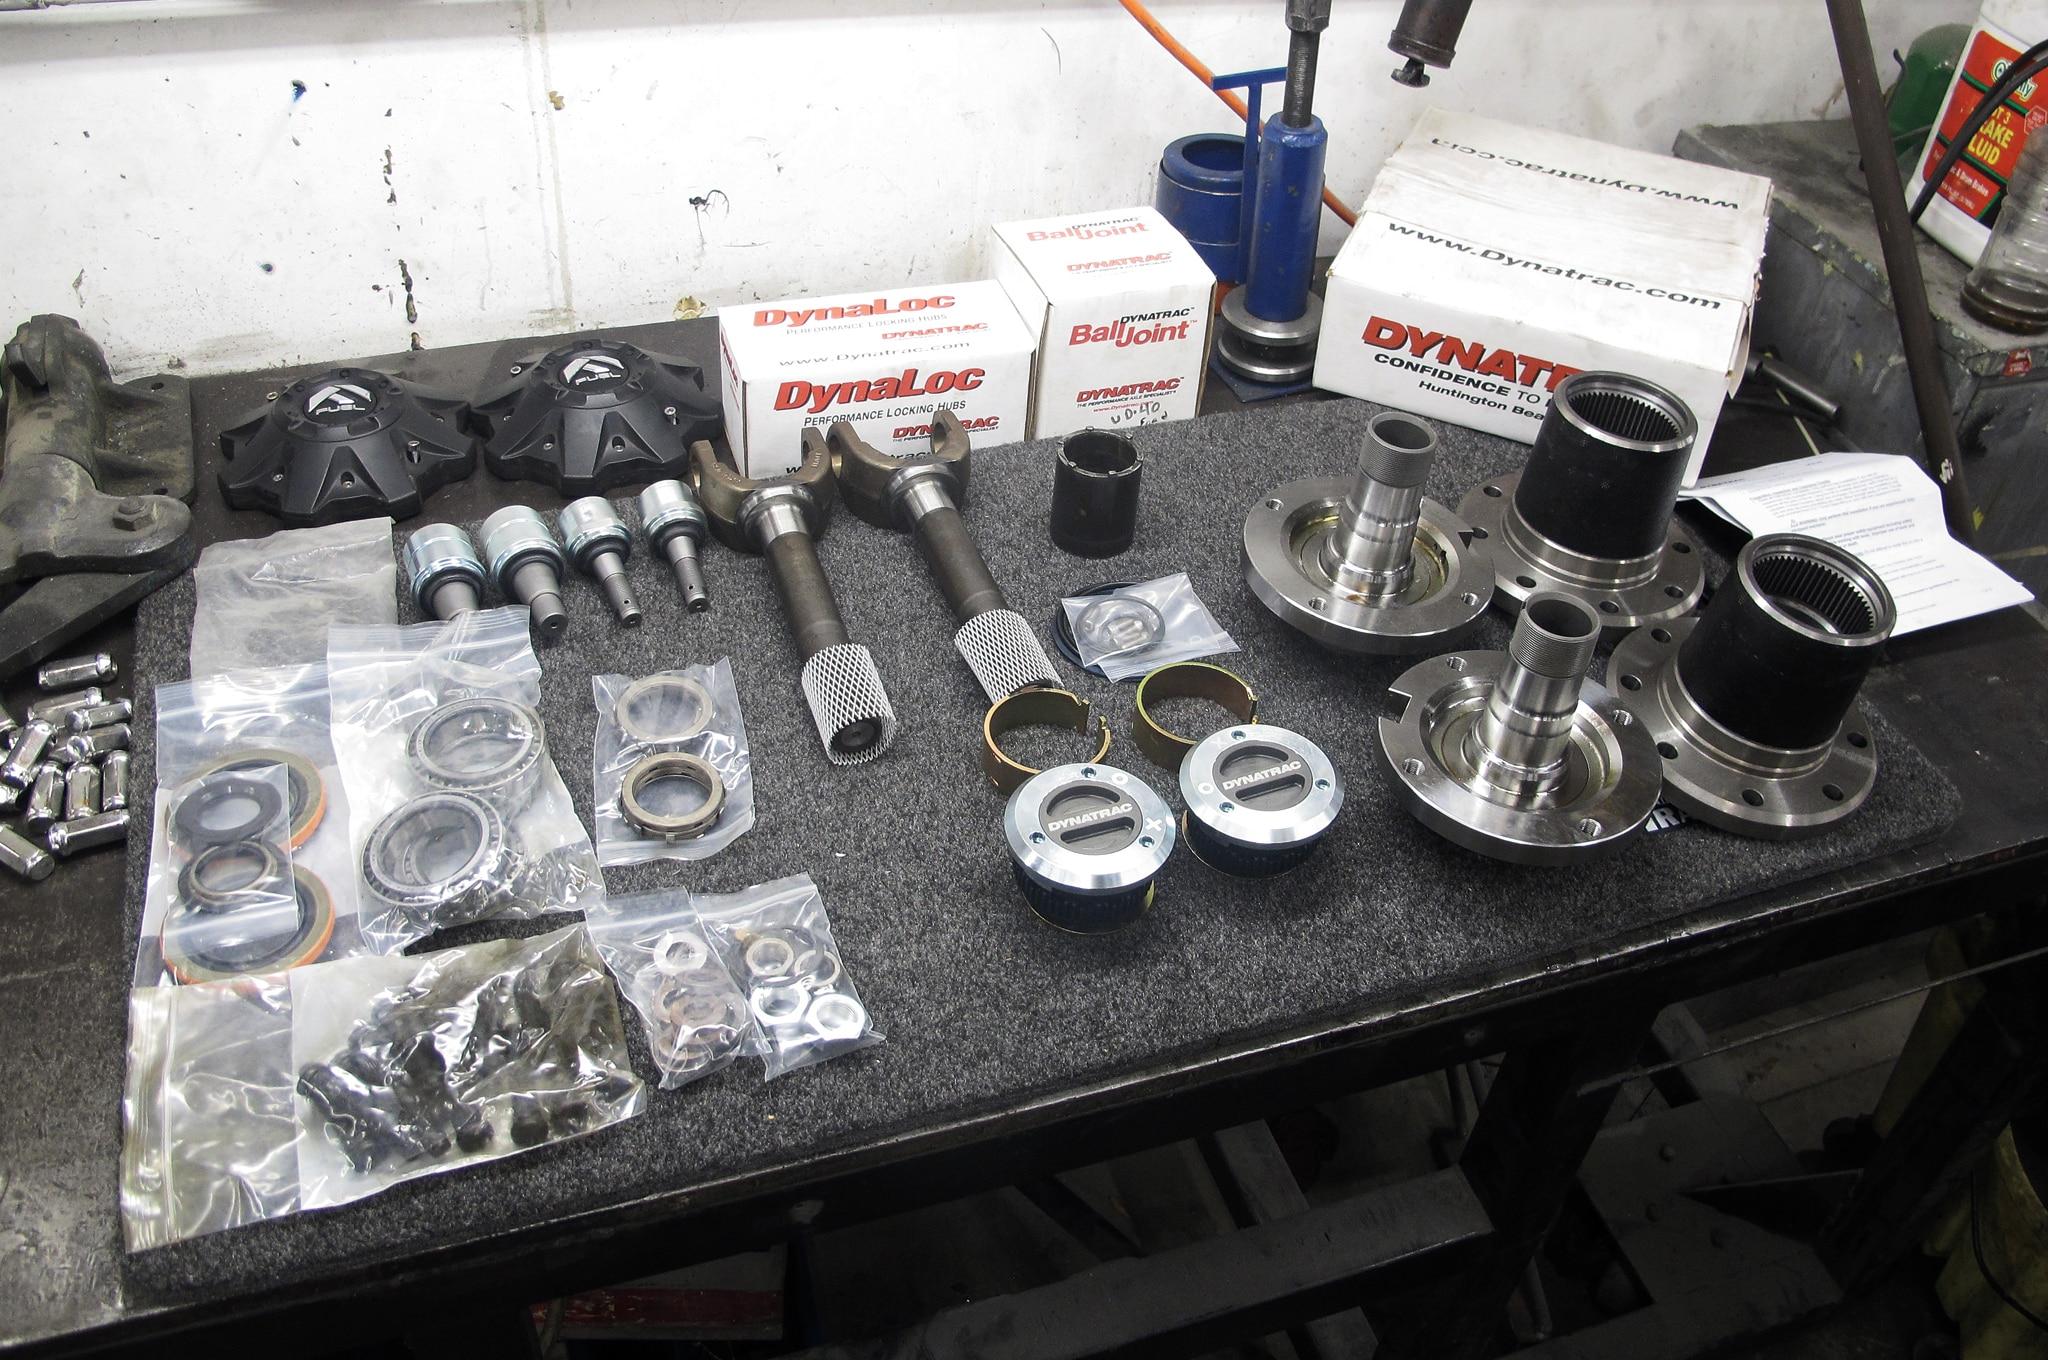 Ford Super Duty Dynatrac Dana 60 Free Spin Kit Install